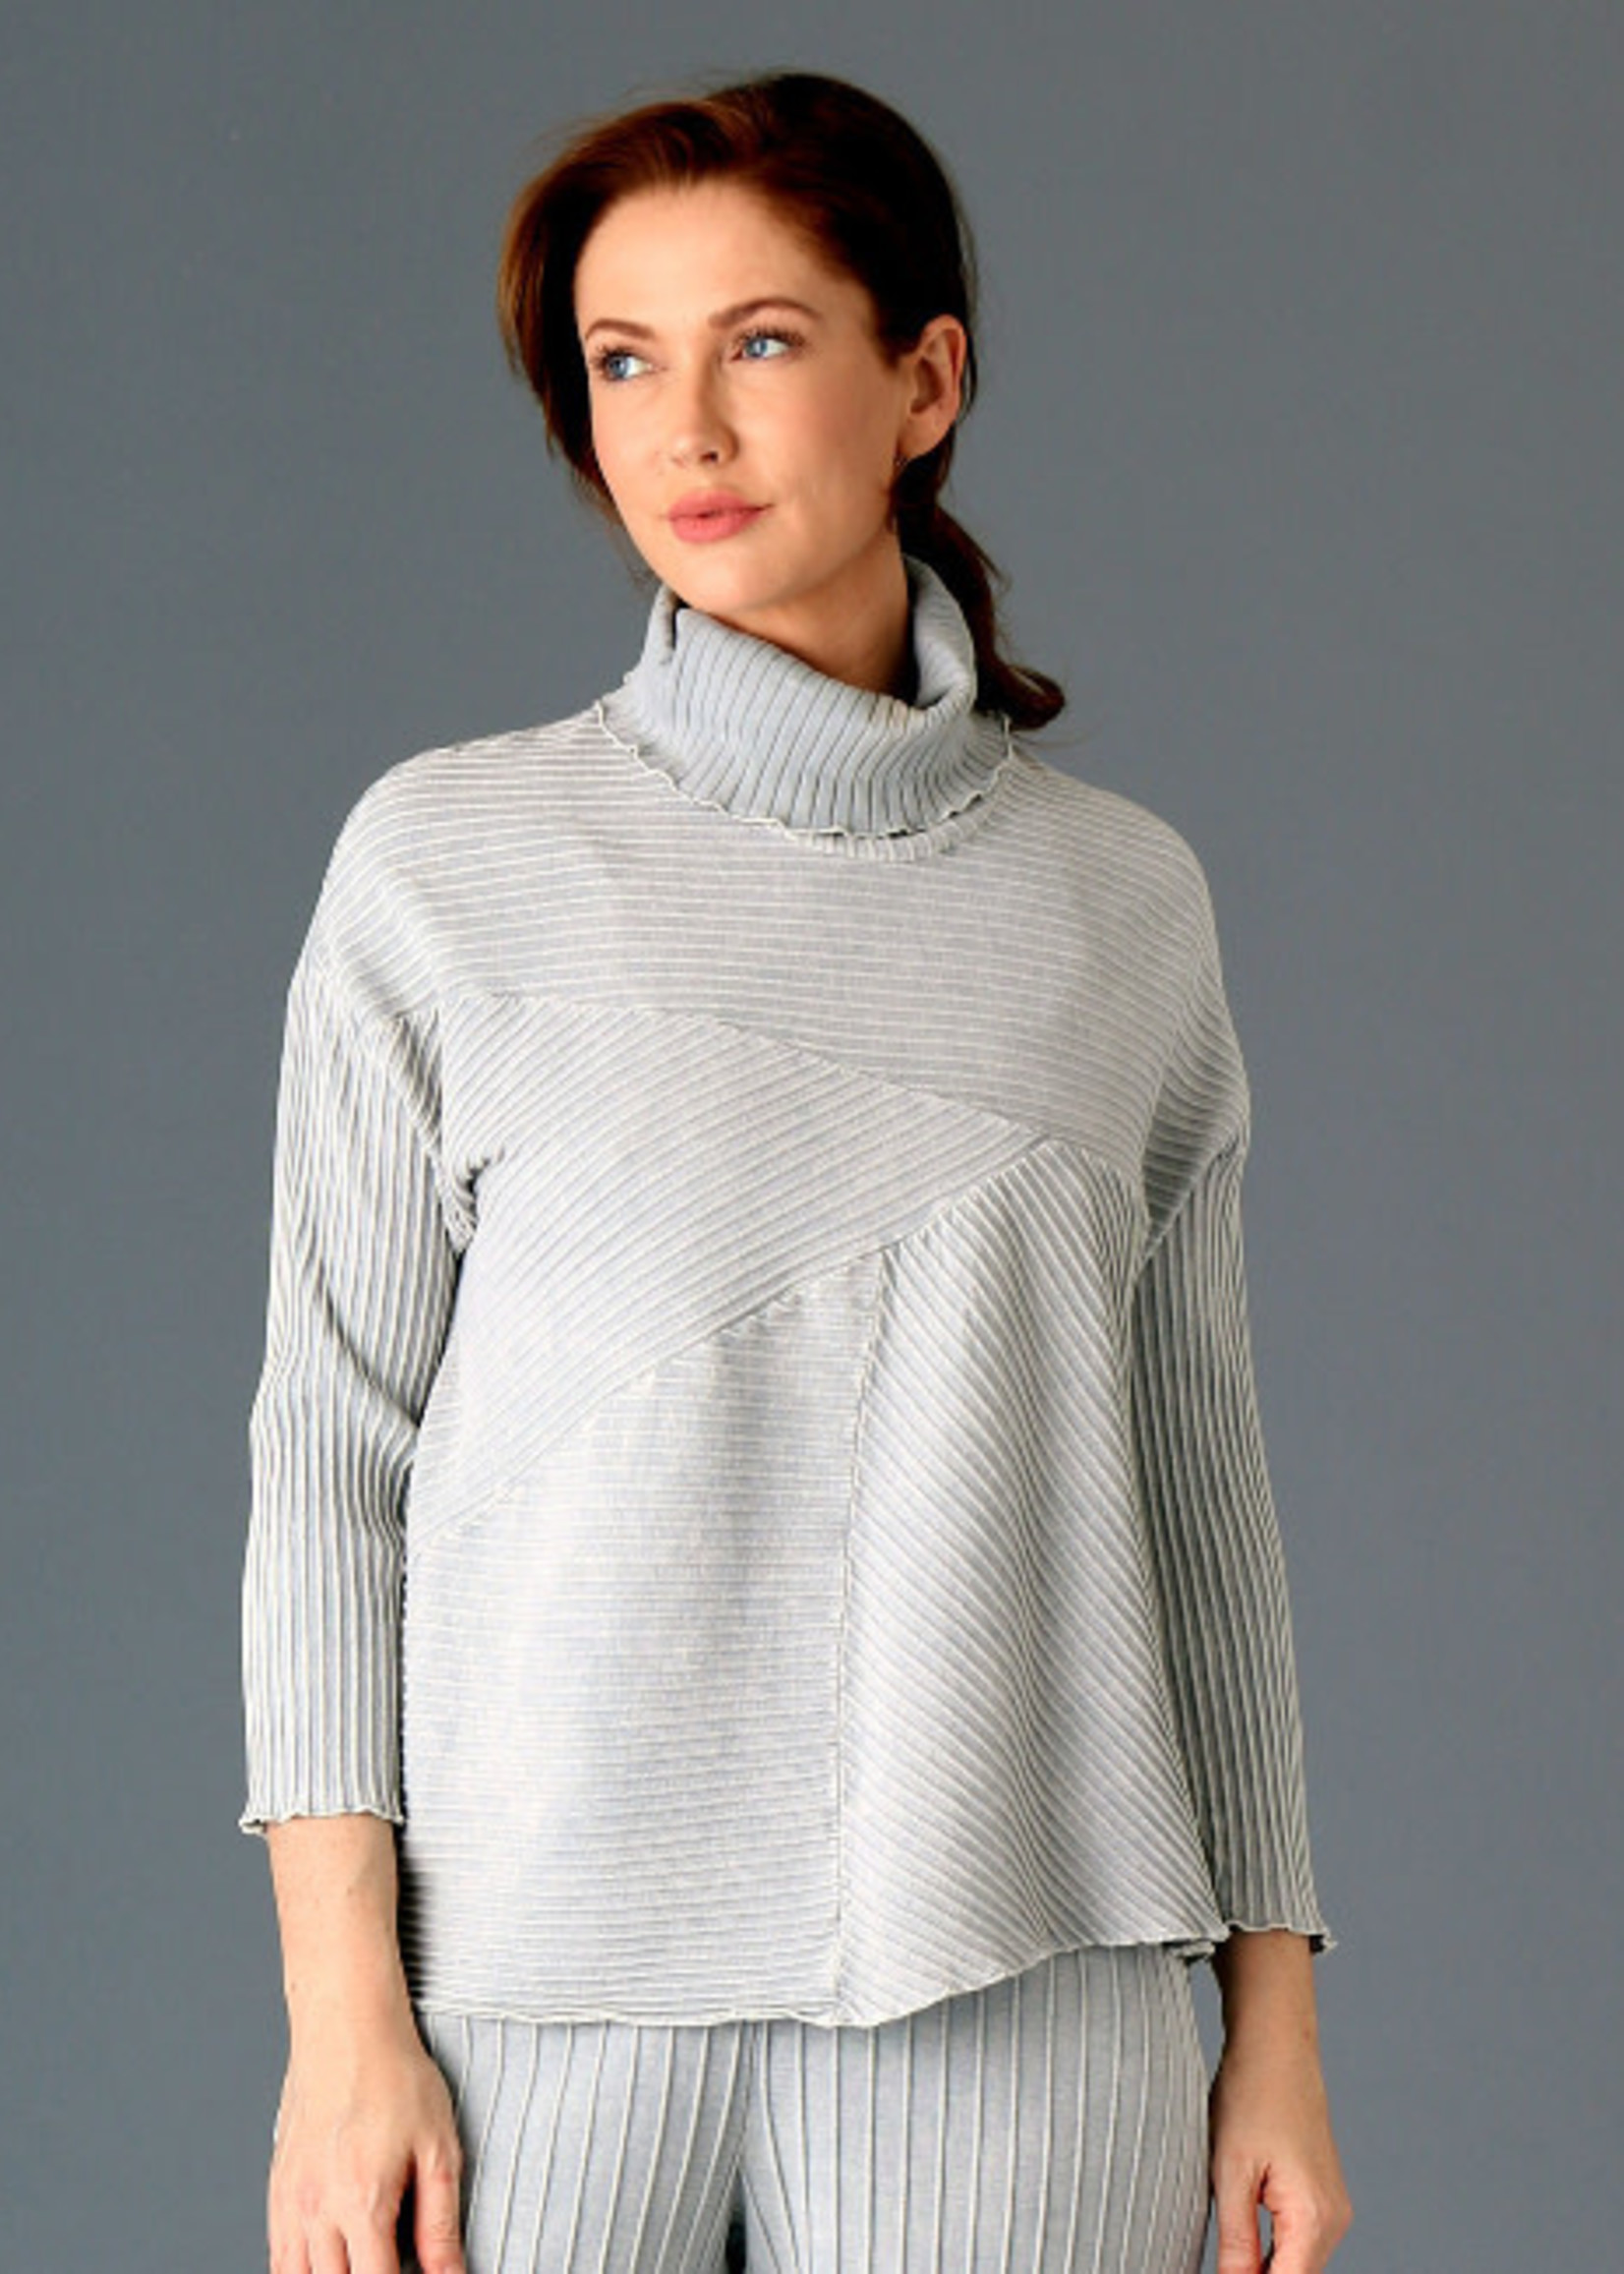 Fenini Light Grey Ribbed Turtleneck Top